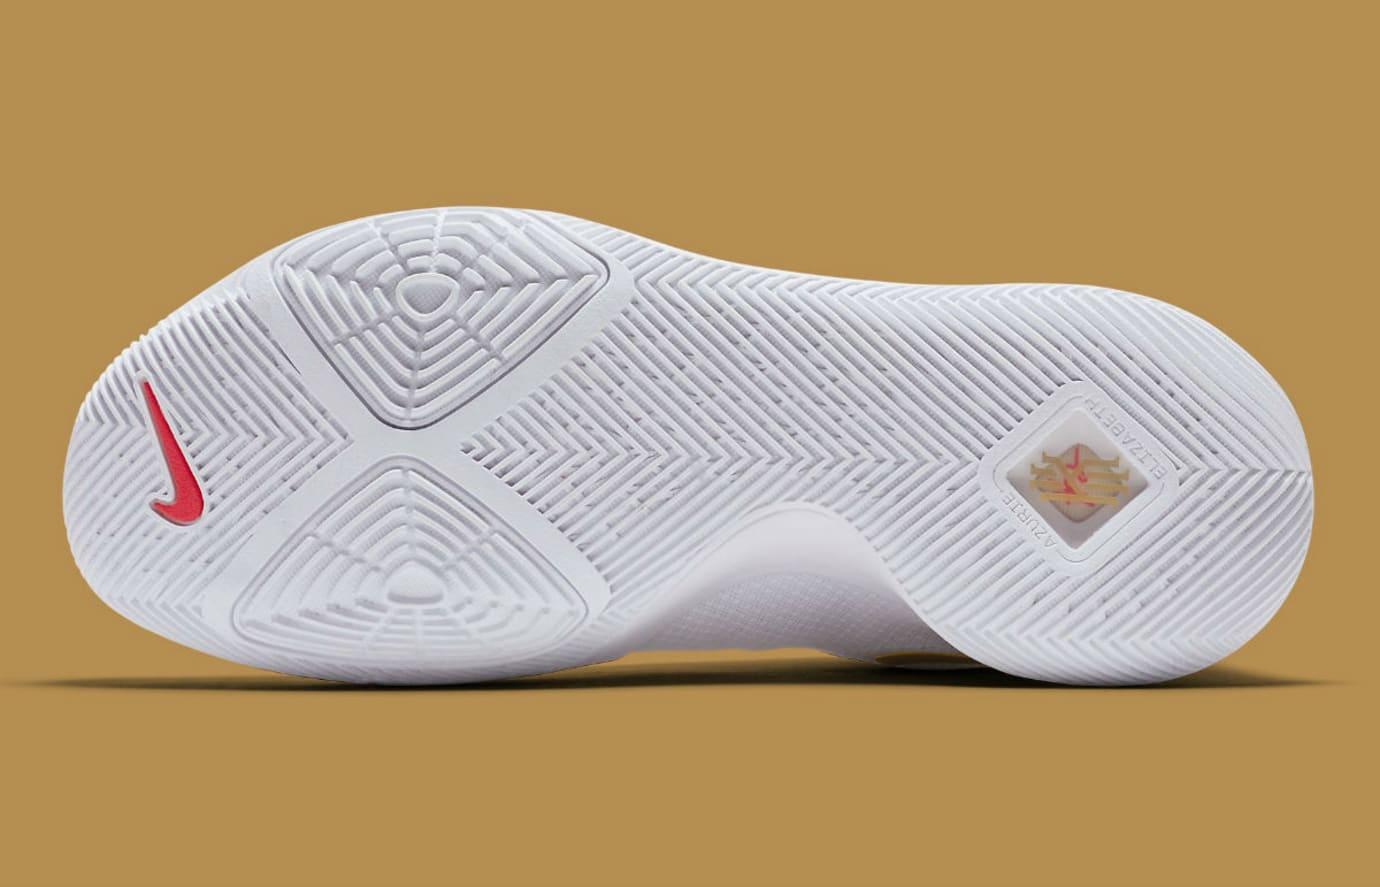 promo code 4e6f6 1cd65 Nike Kyrie 3 White Gold Release Date Sole 852396-902